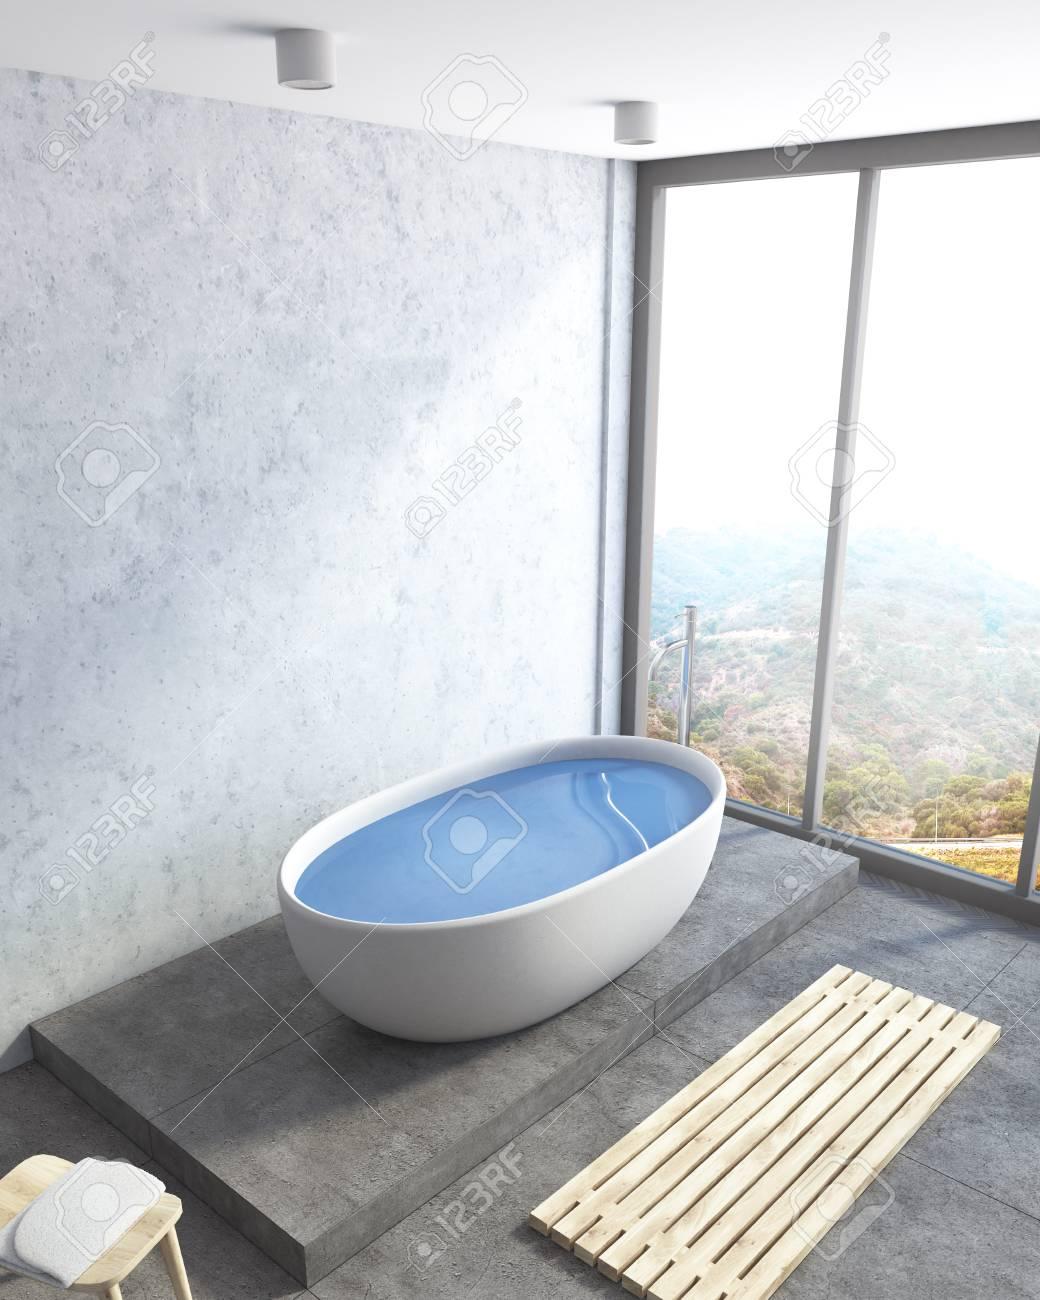 Concrete Wall Bathroom Corner With A Concrete Floor, A White.. Stock ...